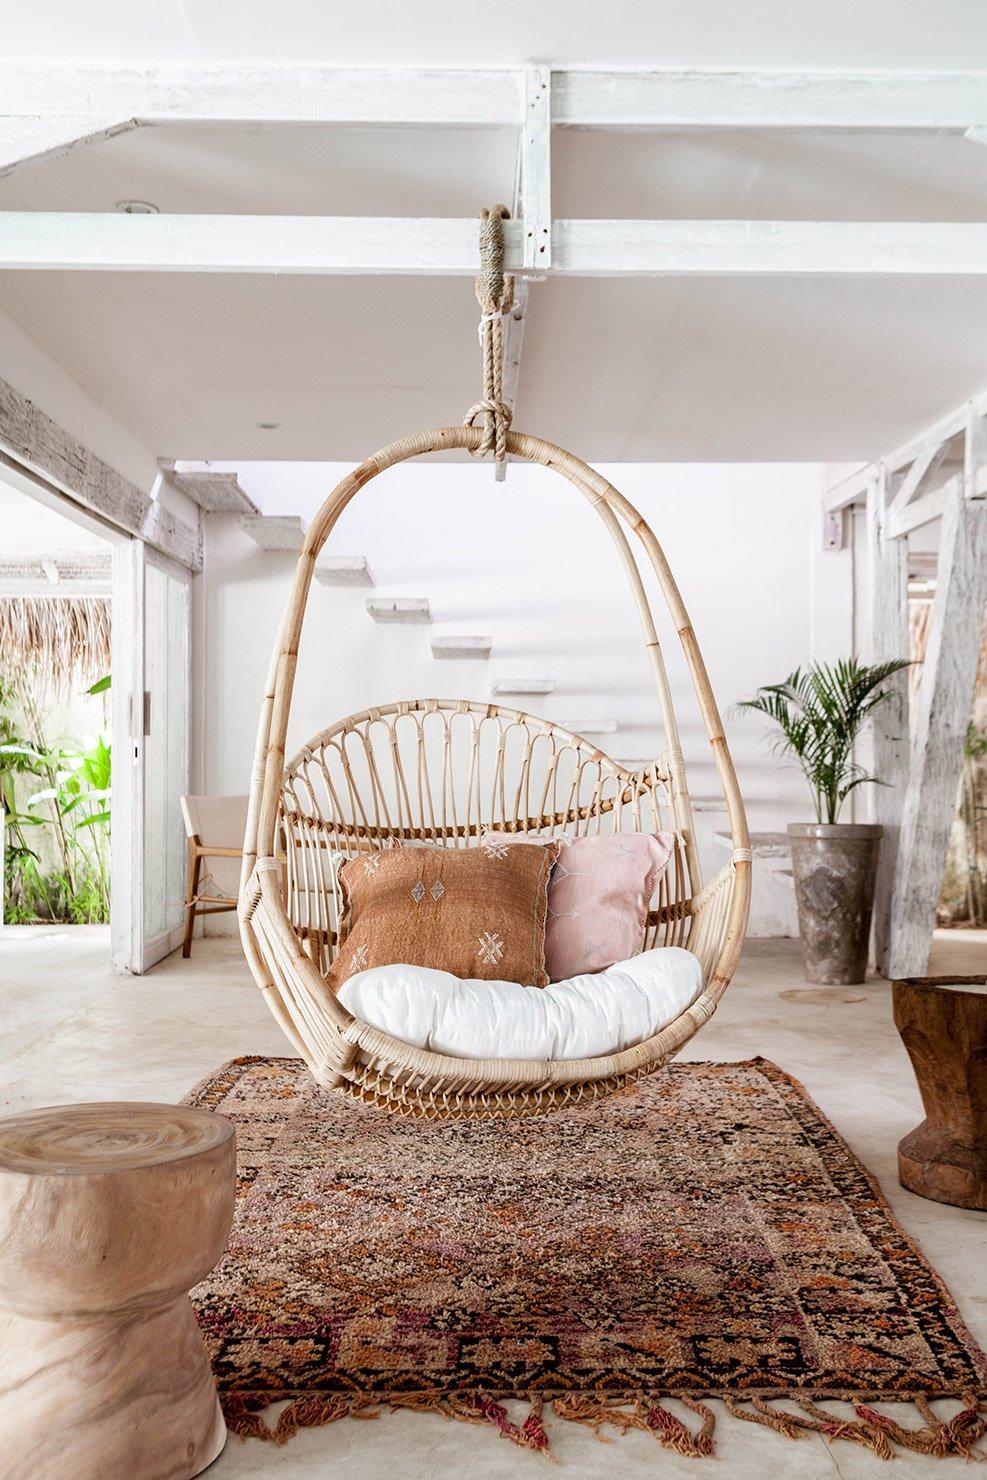 Bali Interiors- rattan